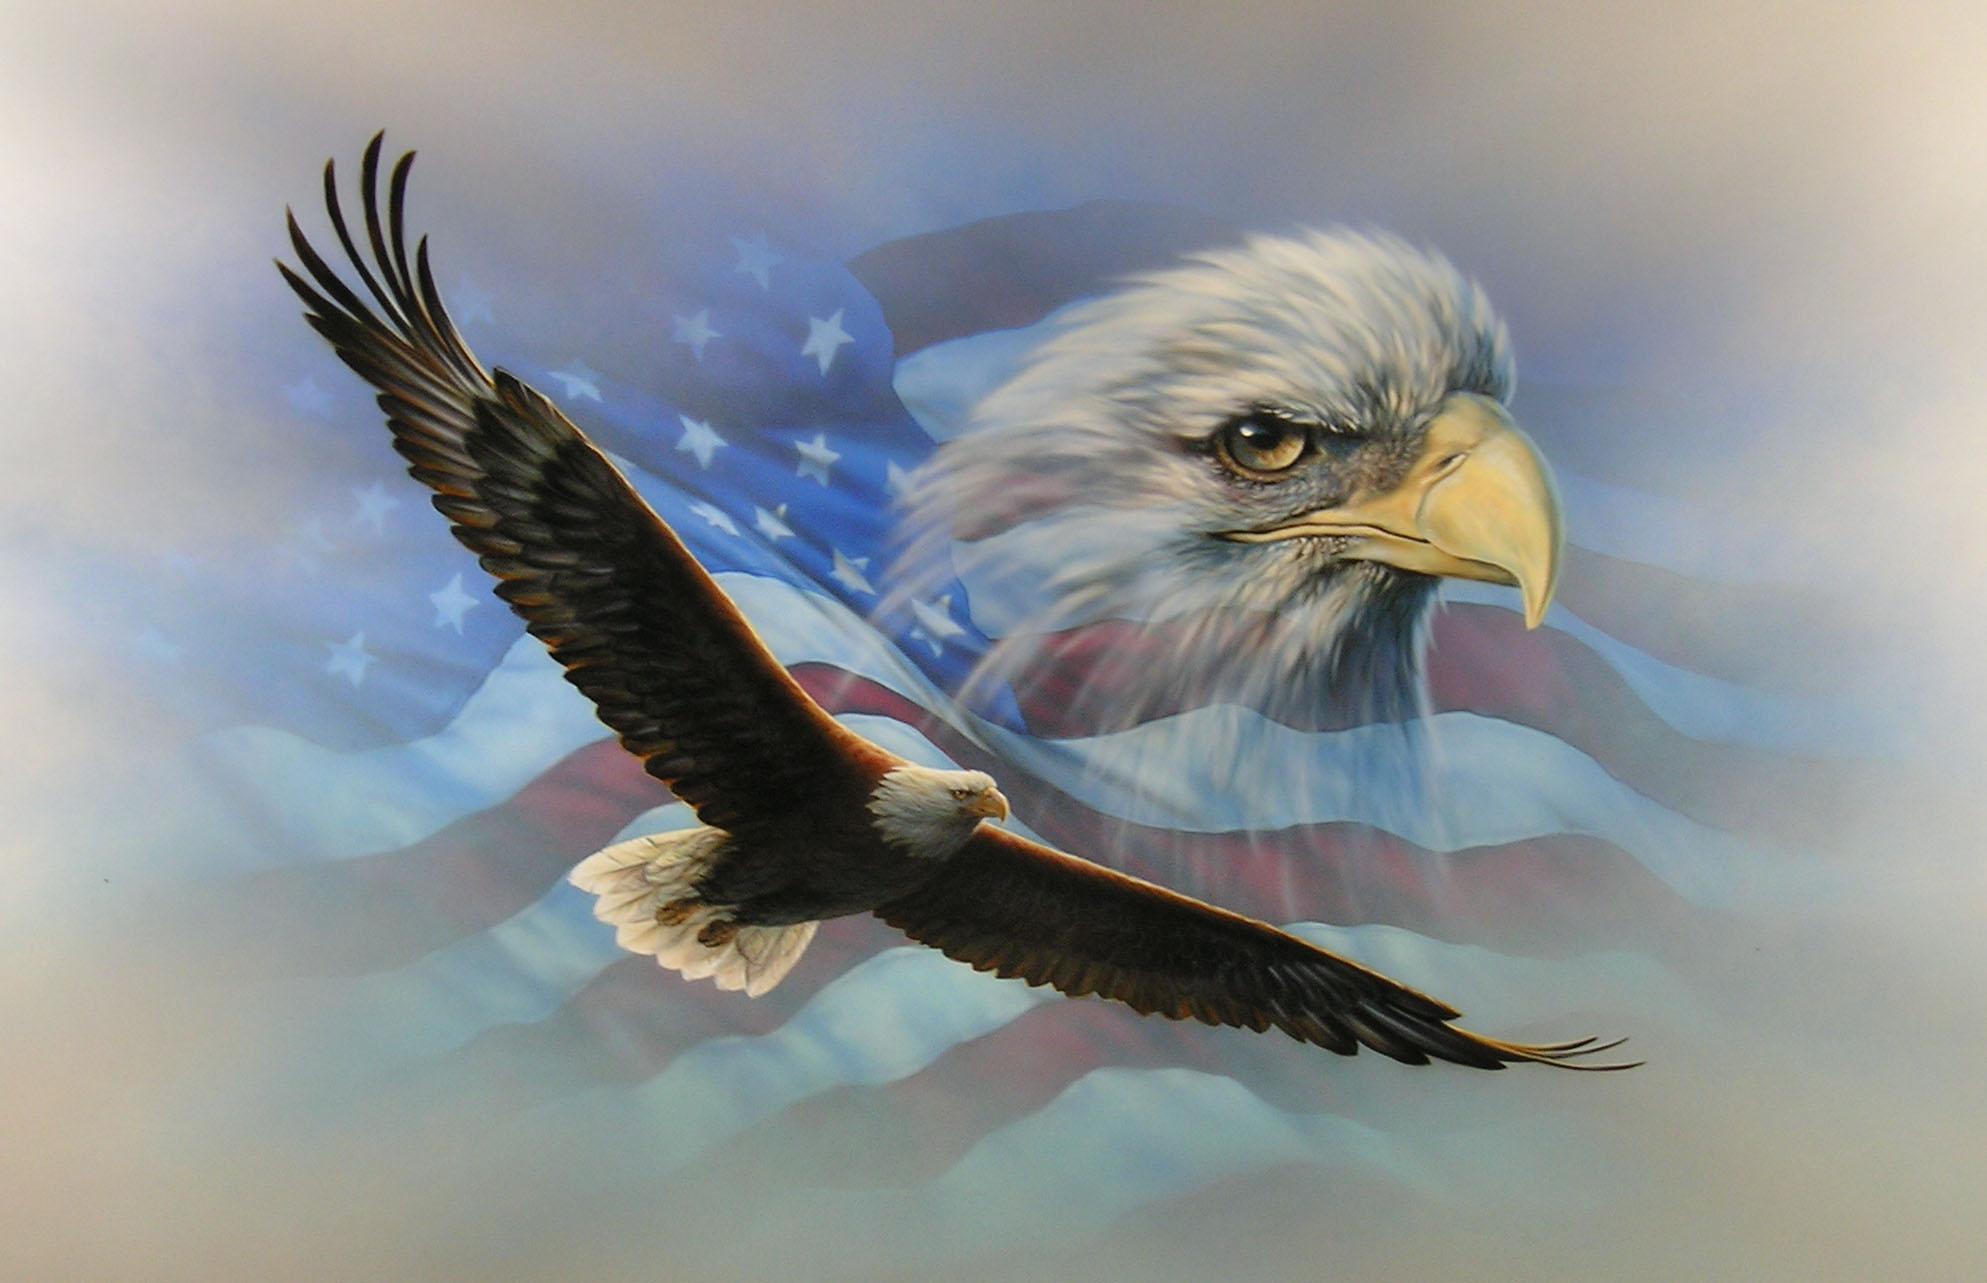 comwp contentuploads201305american flag eagle wallpaperjpg 1987x1283